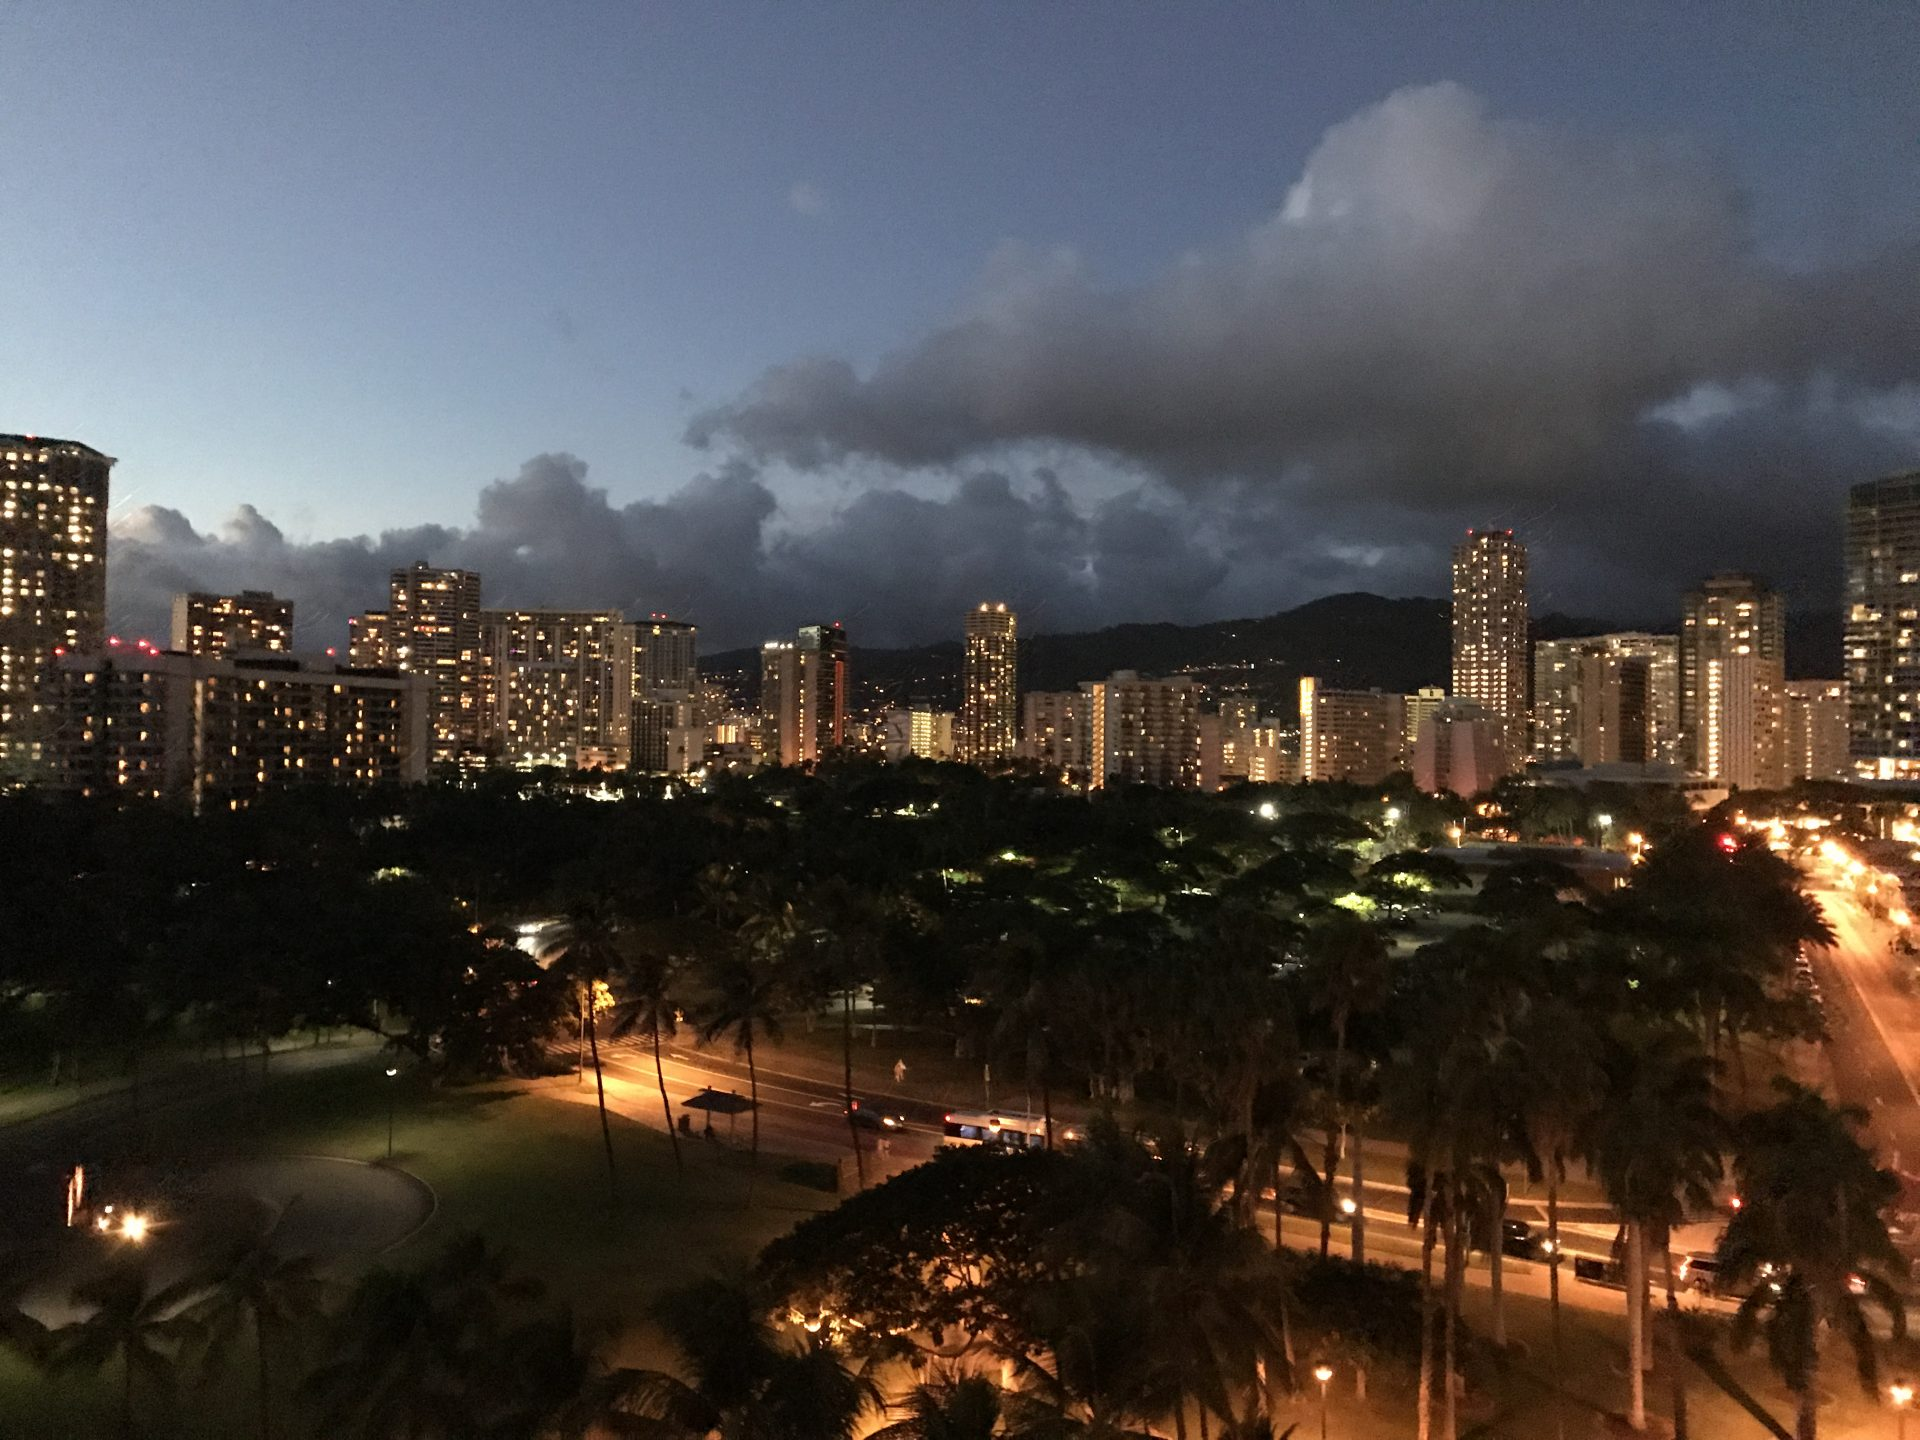 Honolulu by night. (Photo: Courtesy of Laura Cozzolino)